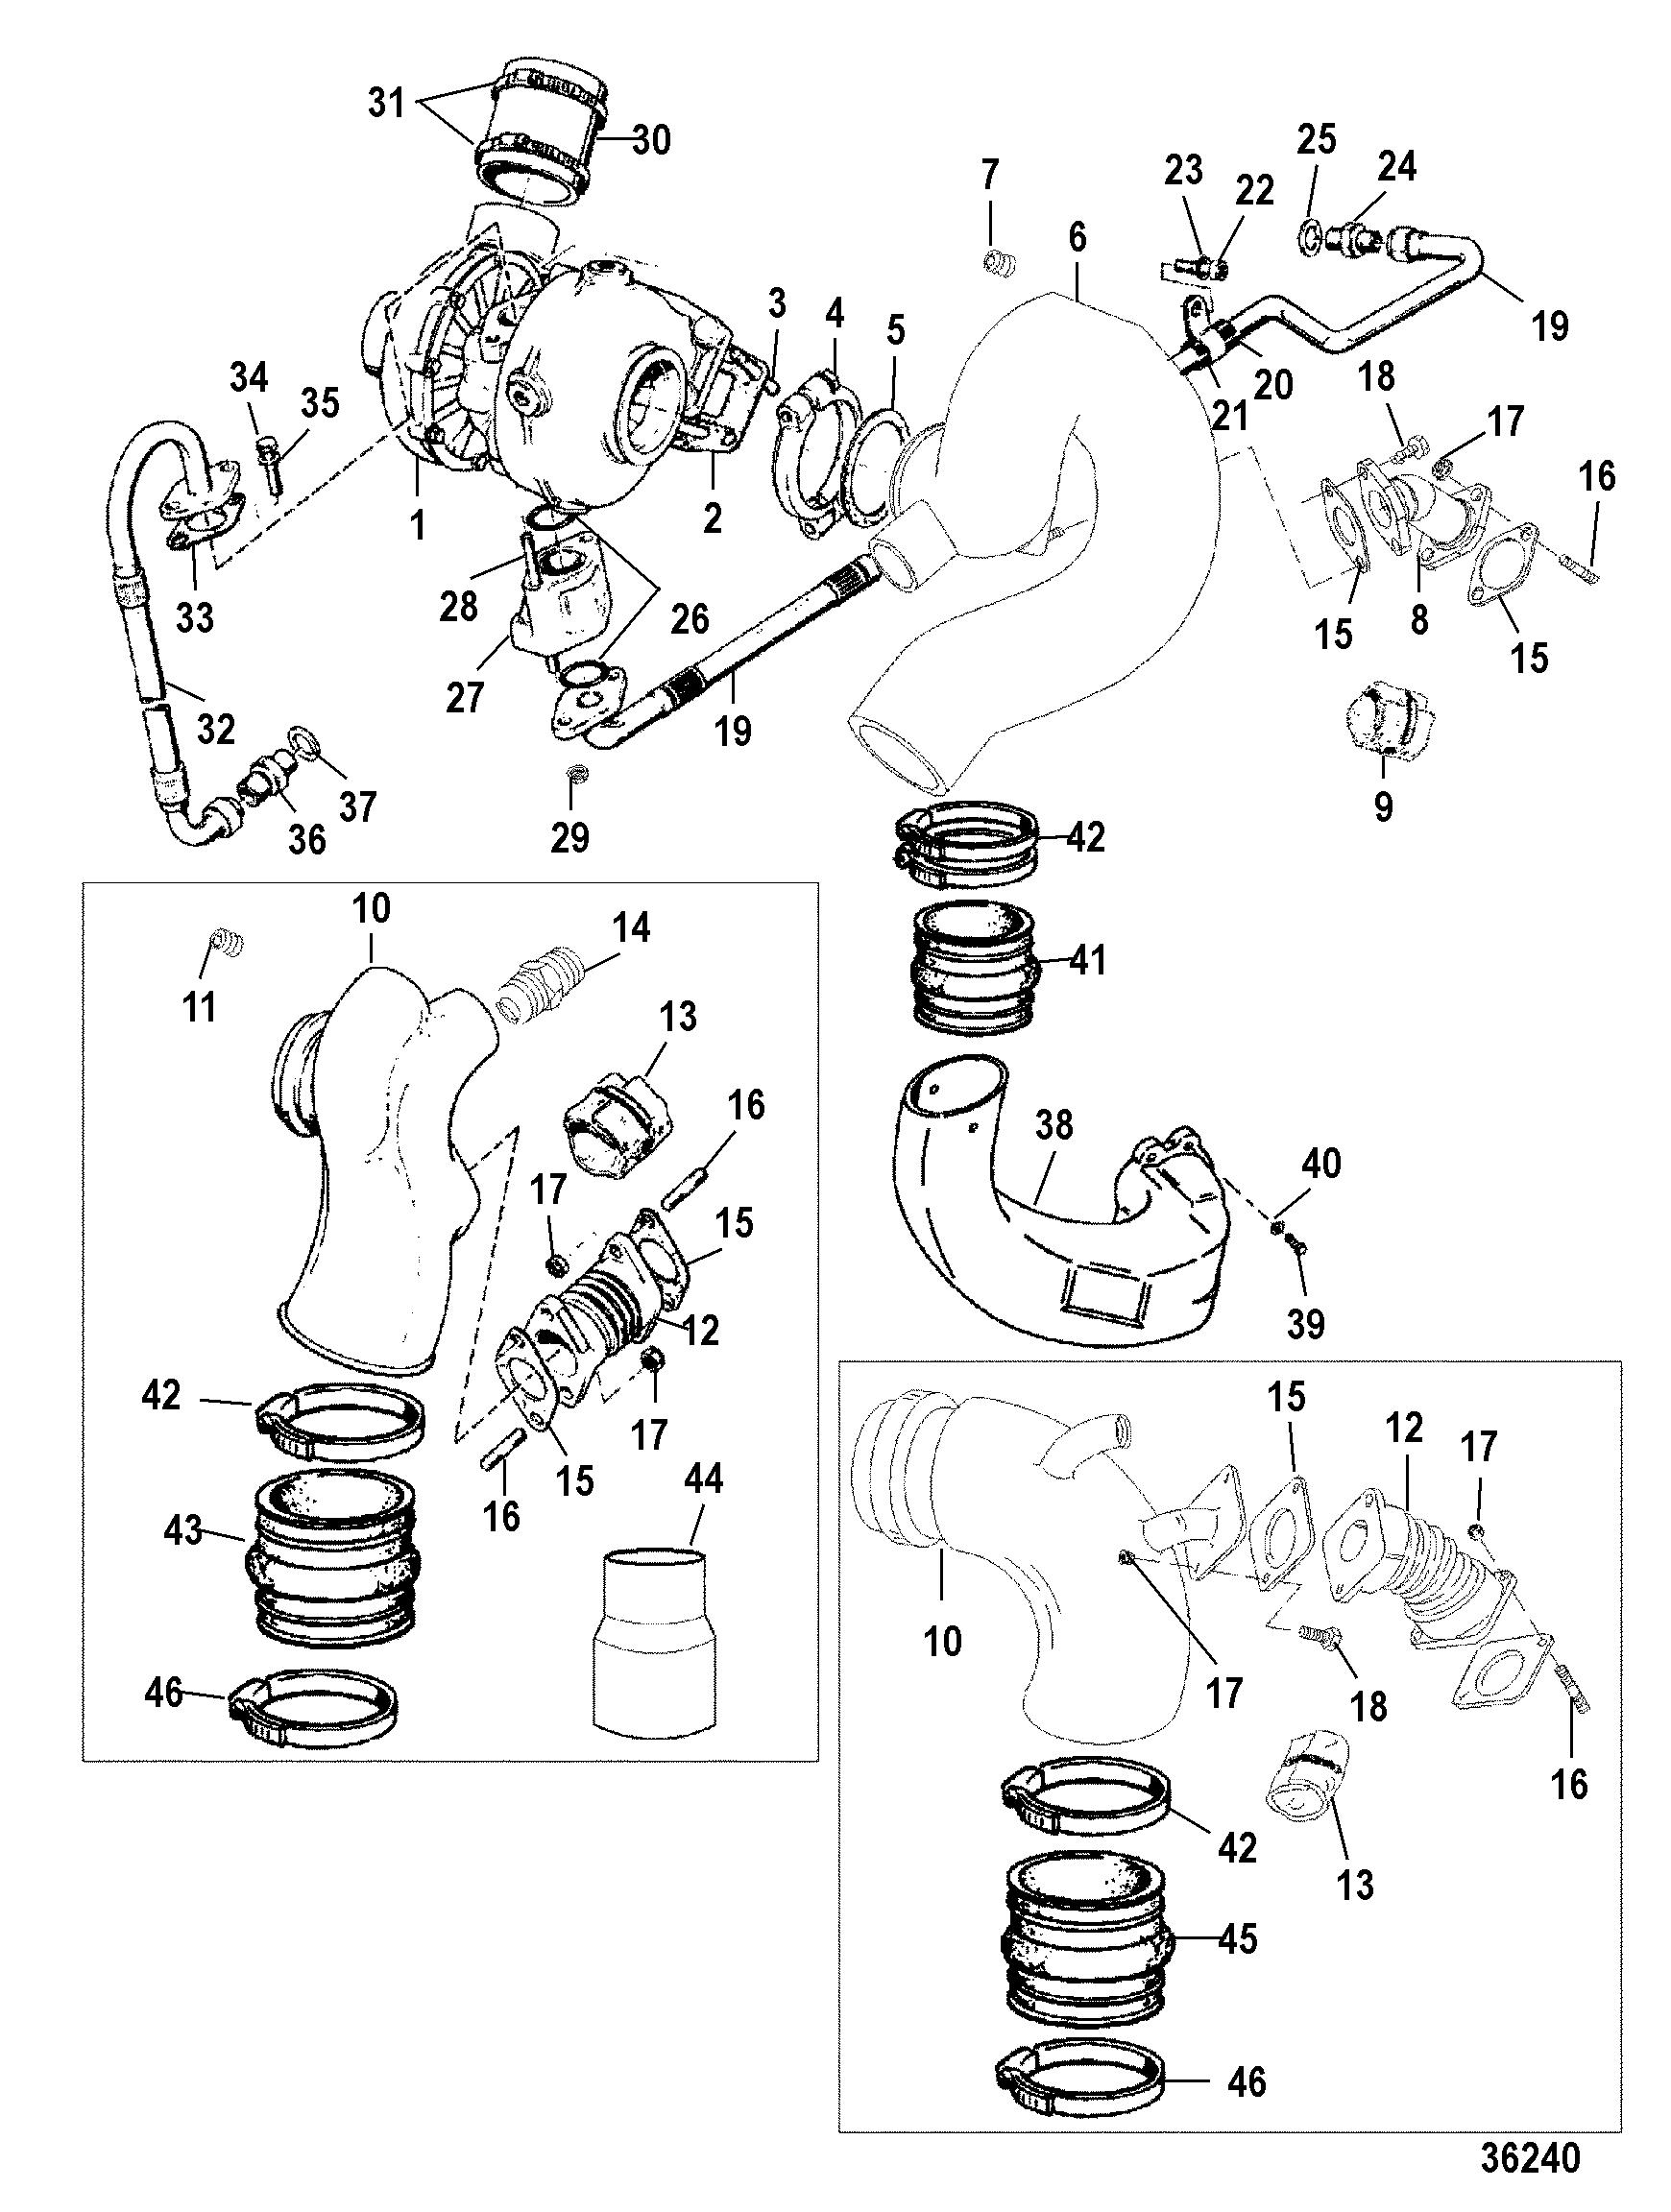 bmw m10 engine diagram international 986 tractor wiring diagram 36, Wiring diagram